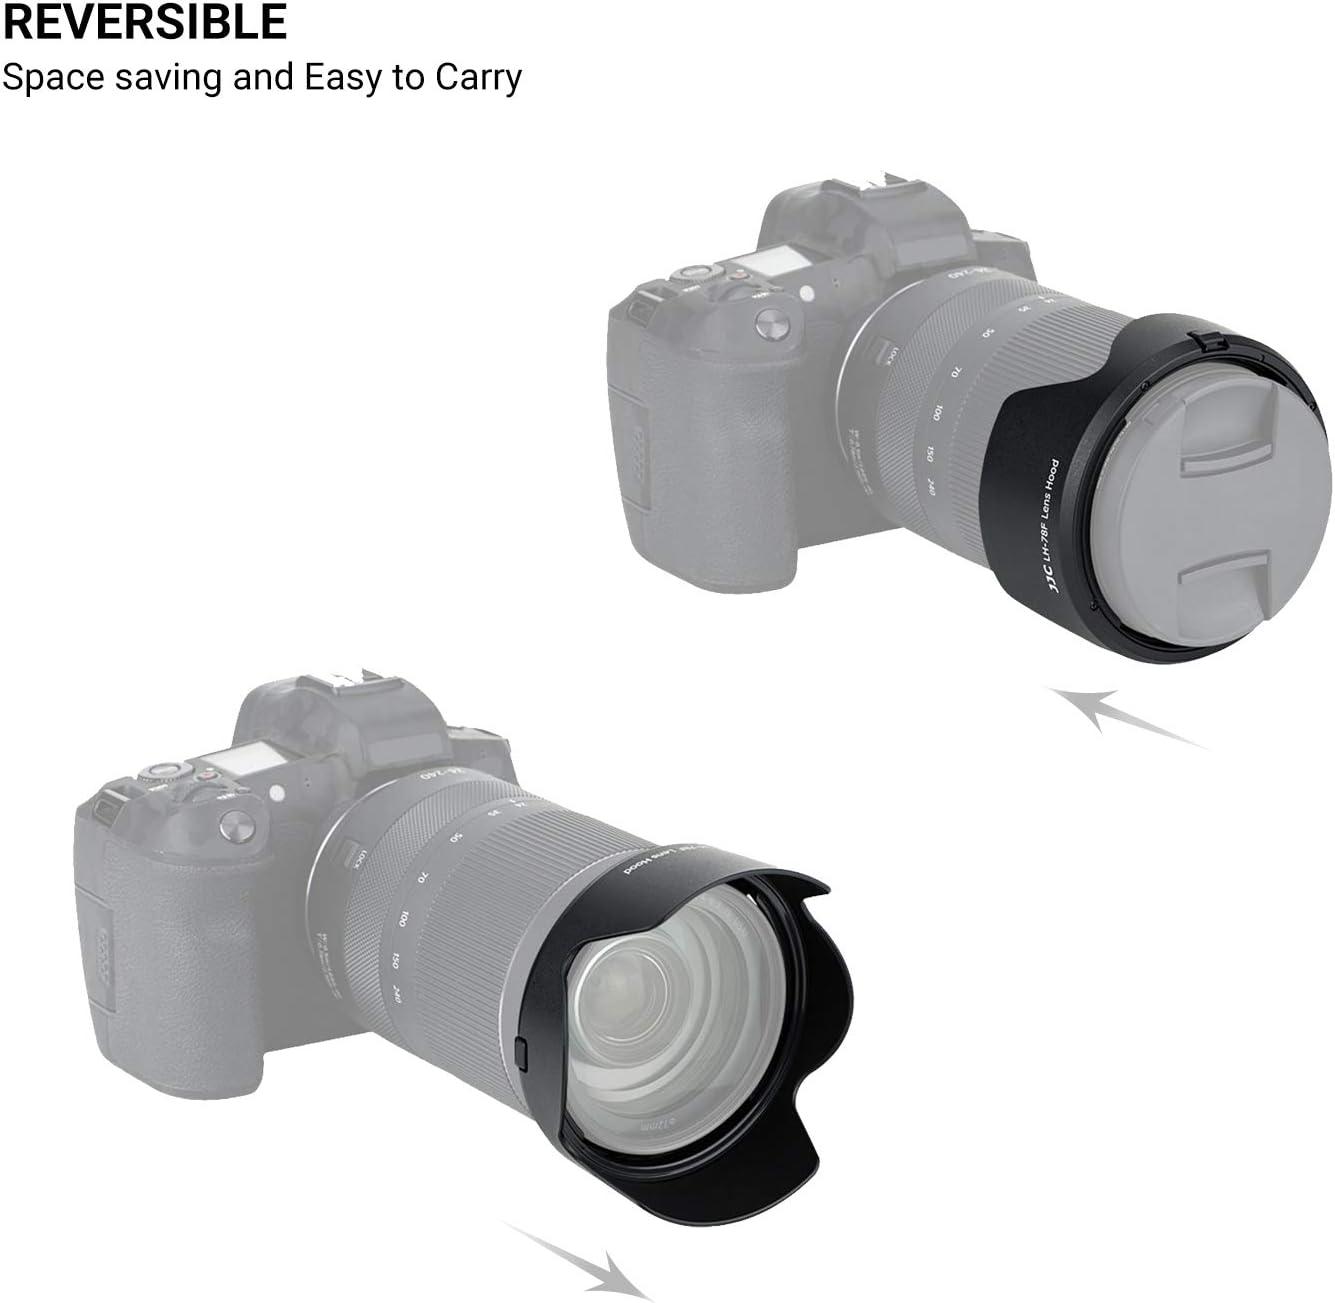 Kamera & Foto Gegenlichtblenden sumicorp.com 72 mm Bajonett ...